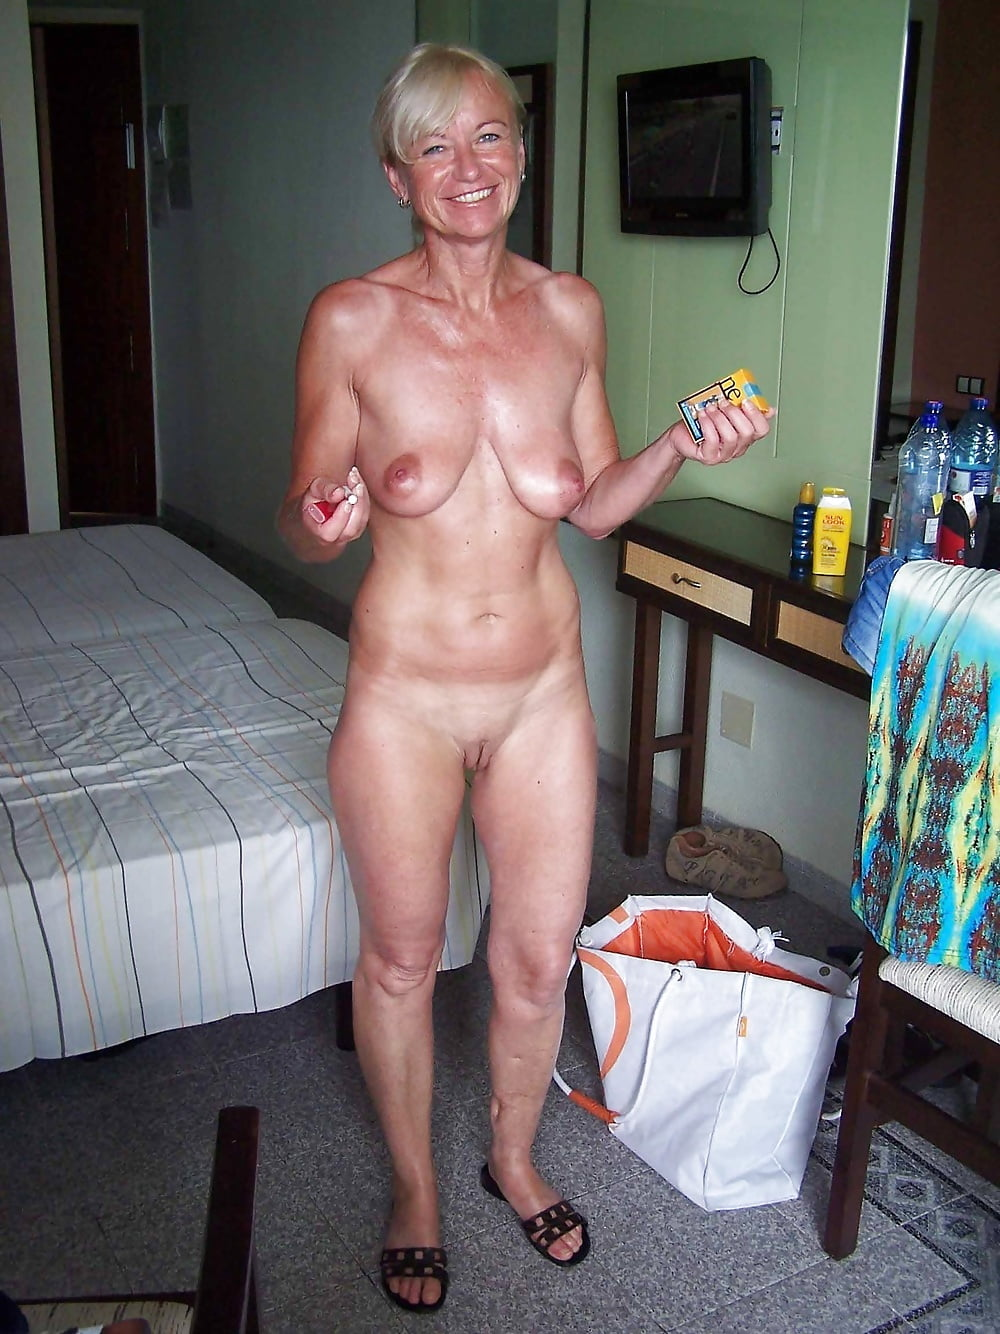 Hot amateur seniors nude, martha smith nude